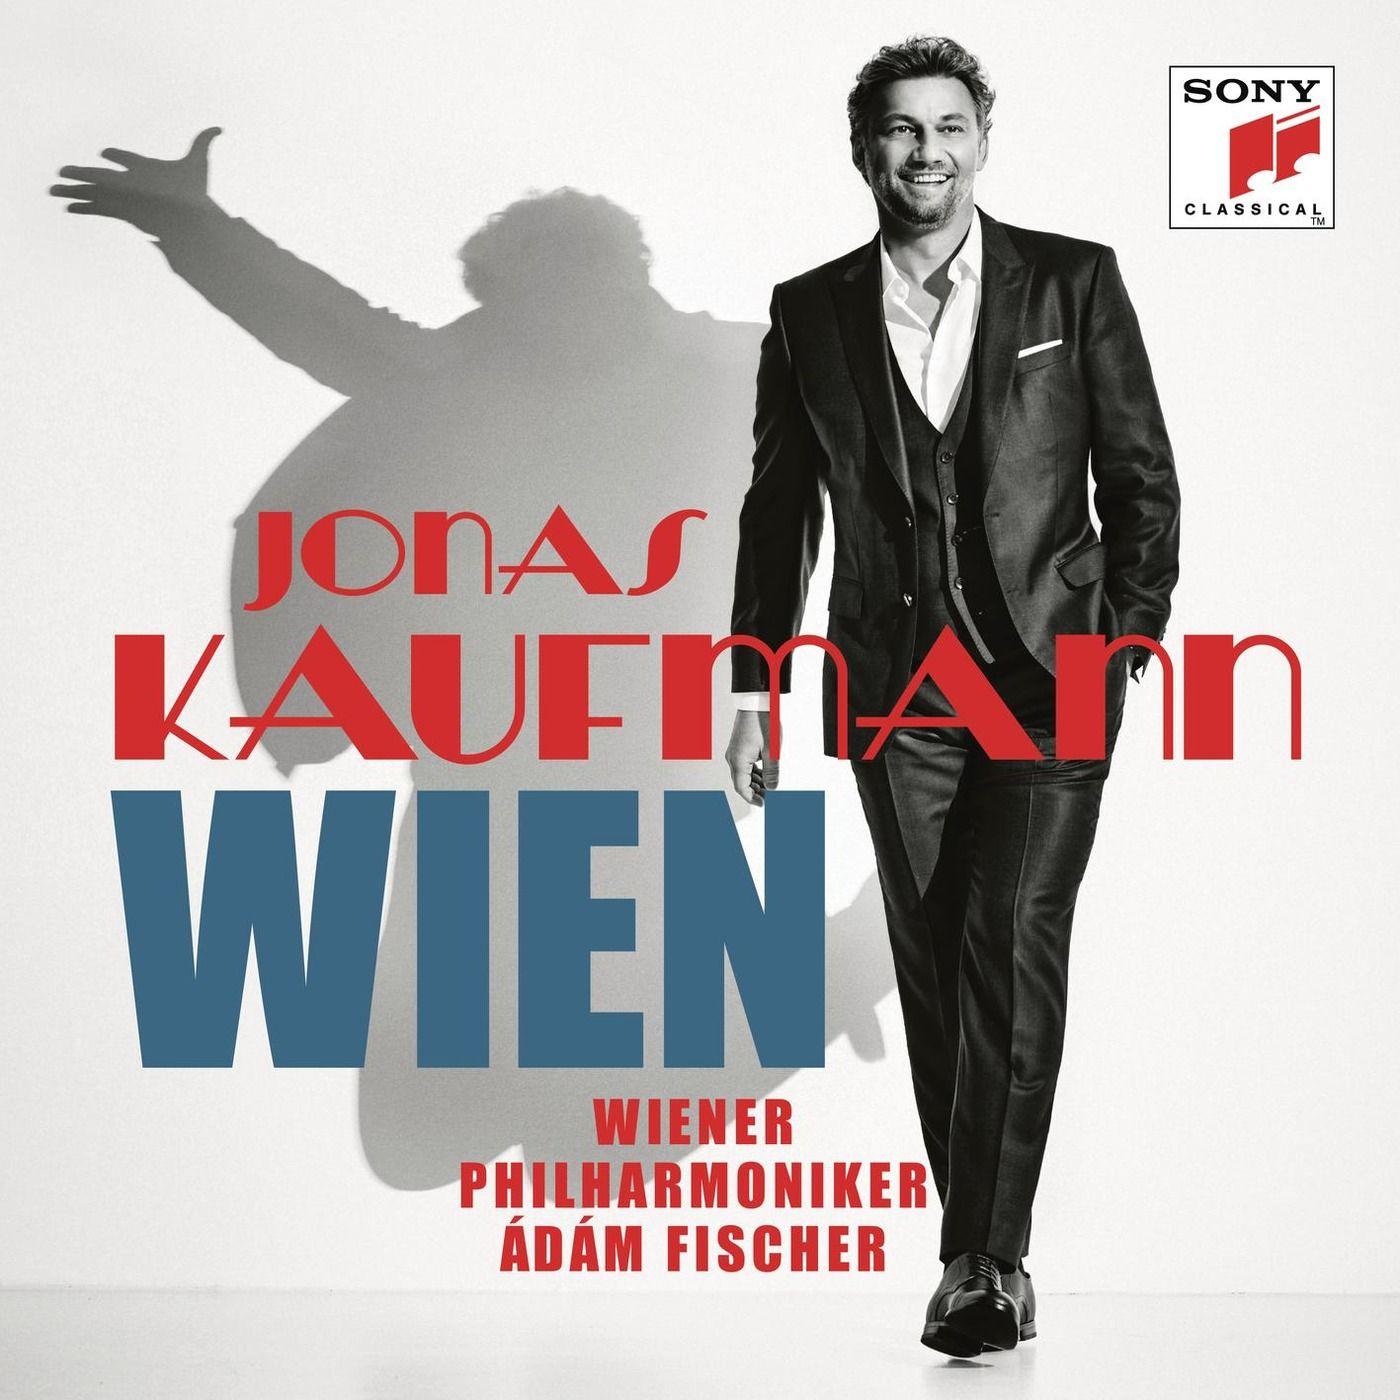 Jonas Kaufmann - Wien album cover